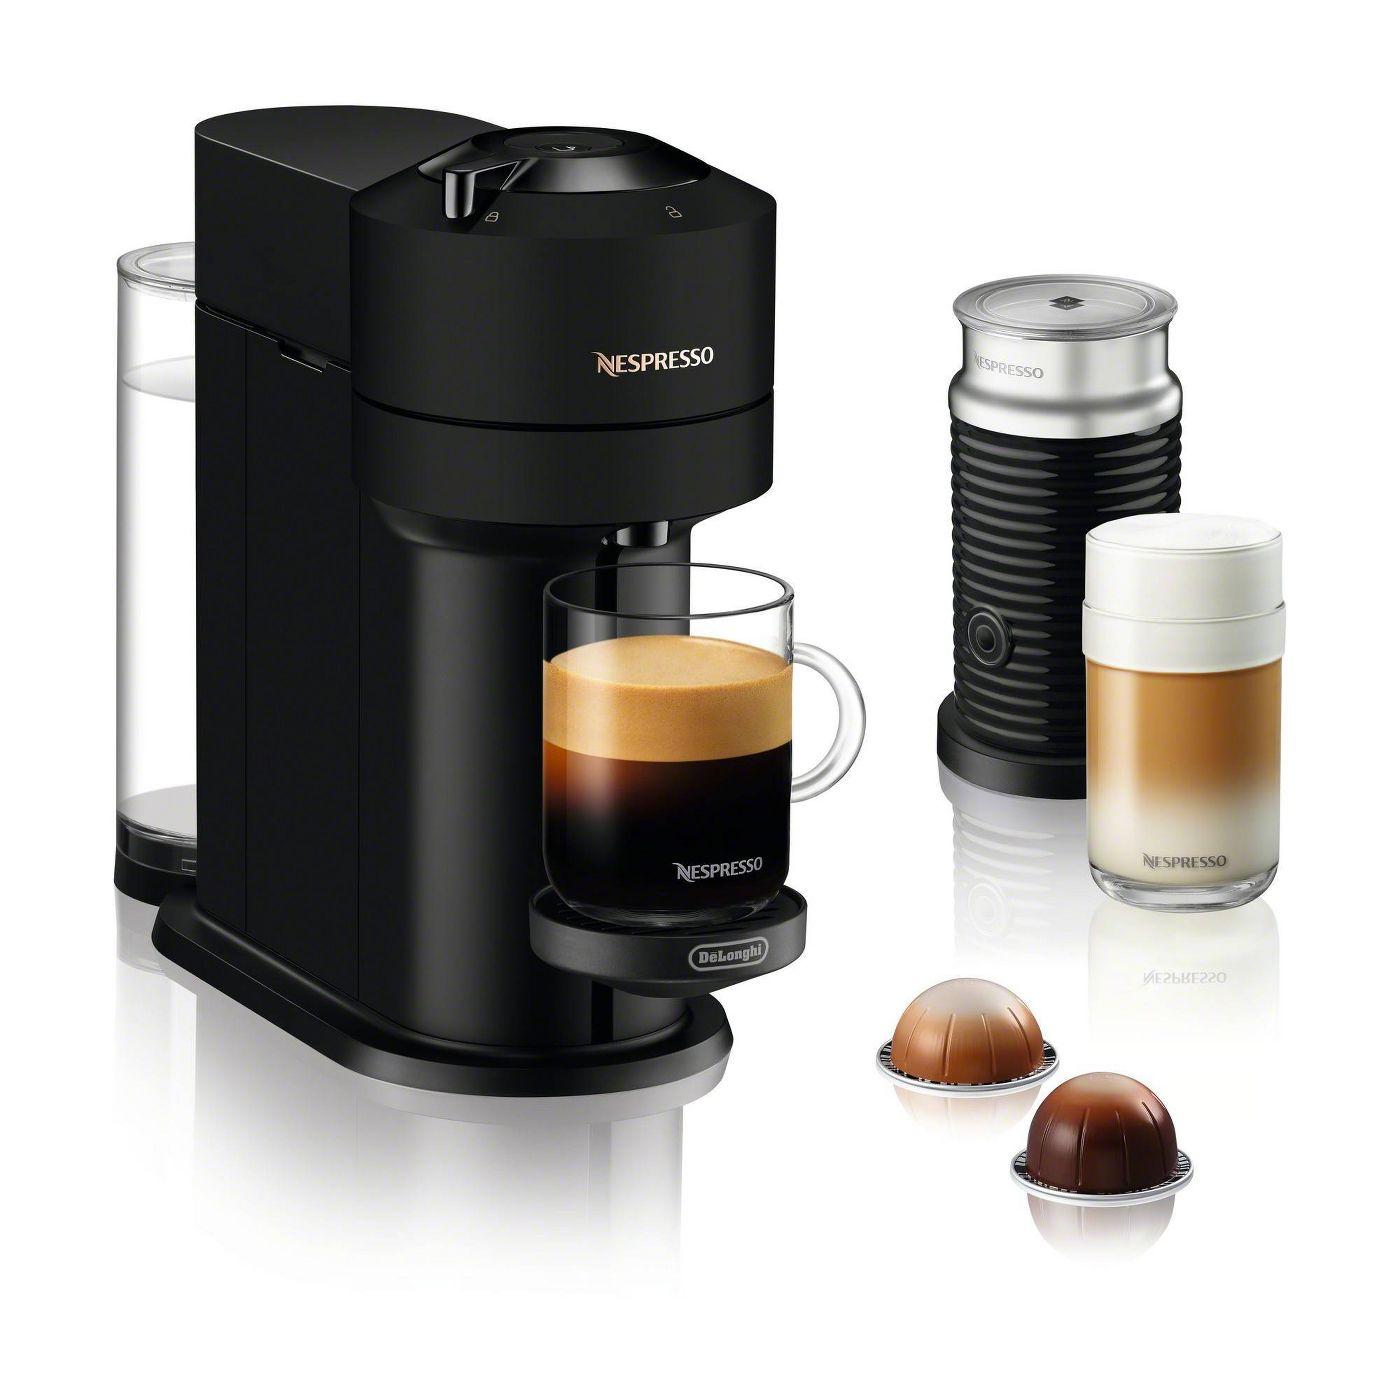 Nespresso Vertuo Next Coffee and Espresso Machine Bundle by De'Longhi - Limited Edition Black Matte - image 1 of 6